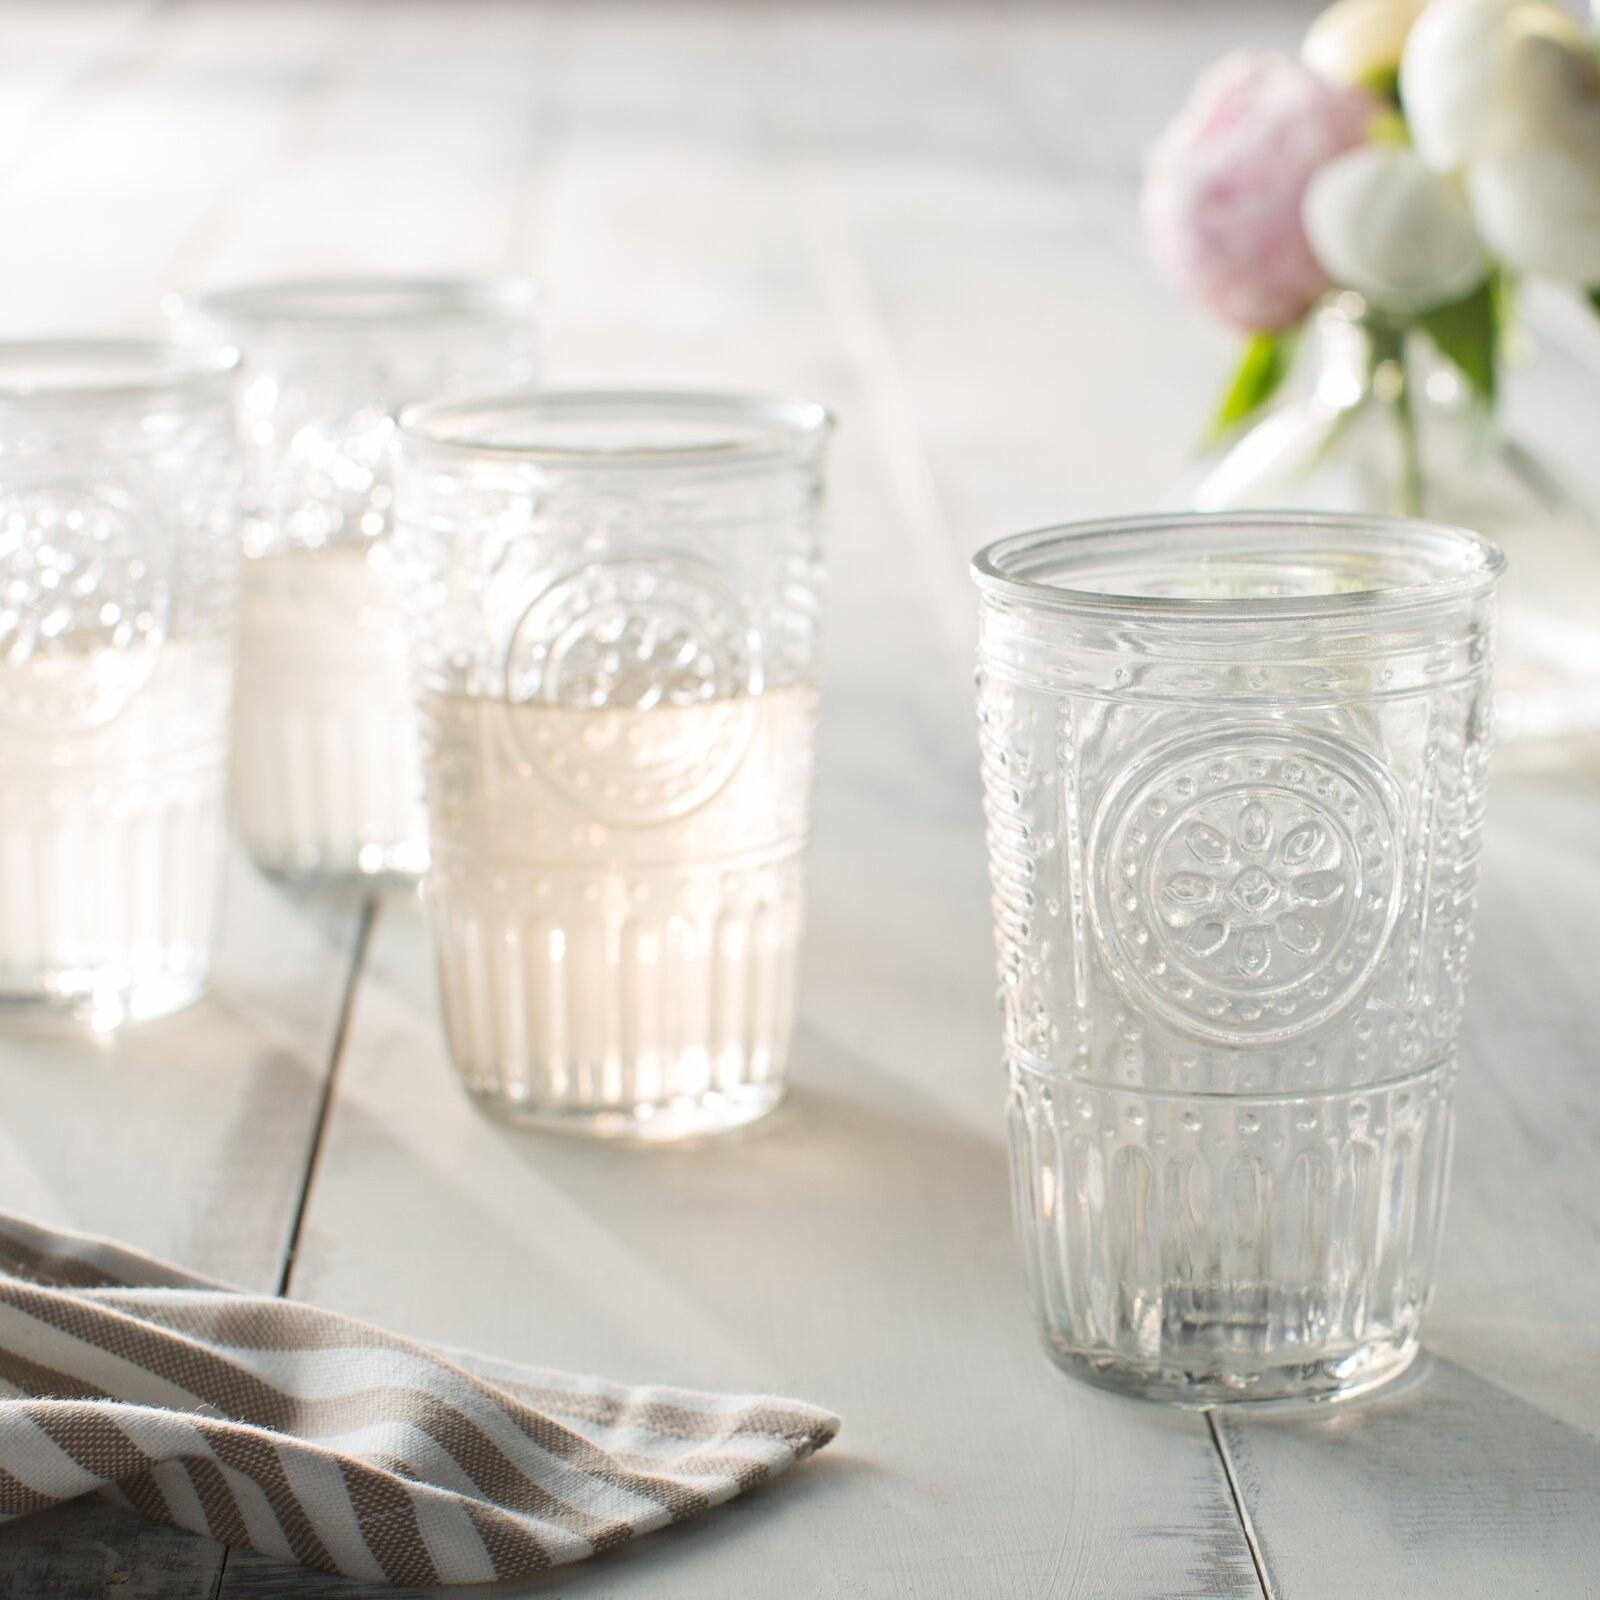 white glass drinking glasses